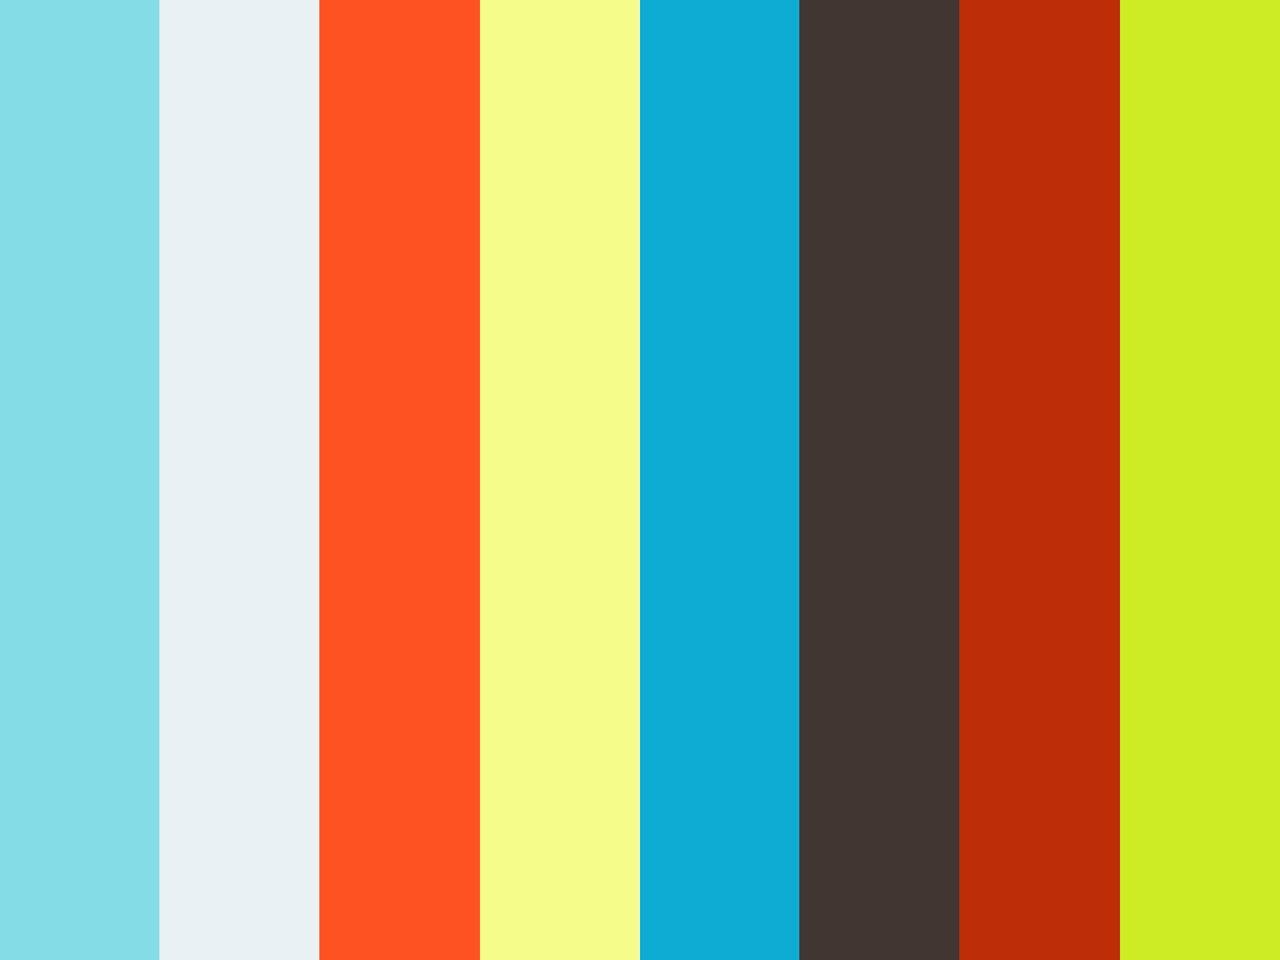 A440 ||: ♫ ♭ | ♮ ♫ | . ♫ :||   W/ Jermaine Stegall